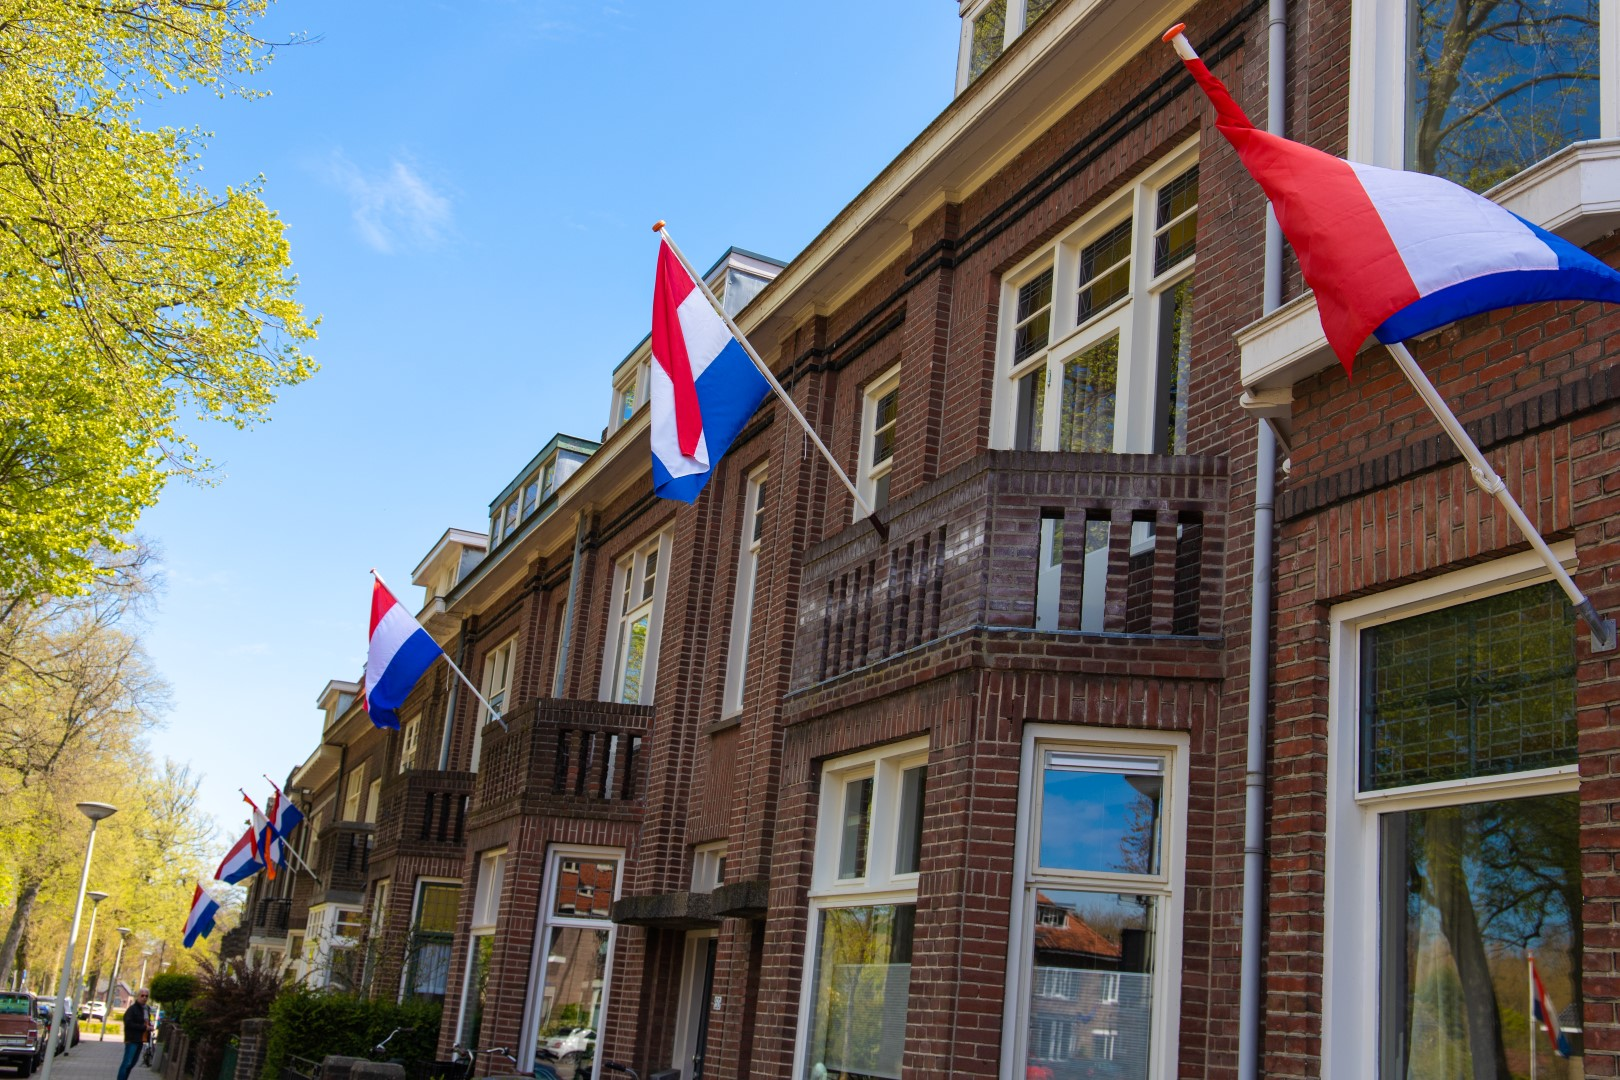 koningsdag 2021 kingsday woningsdag oranje 27 april vlag